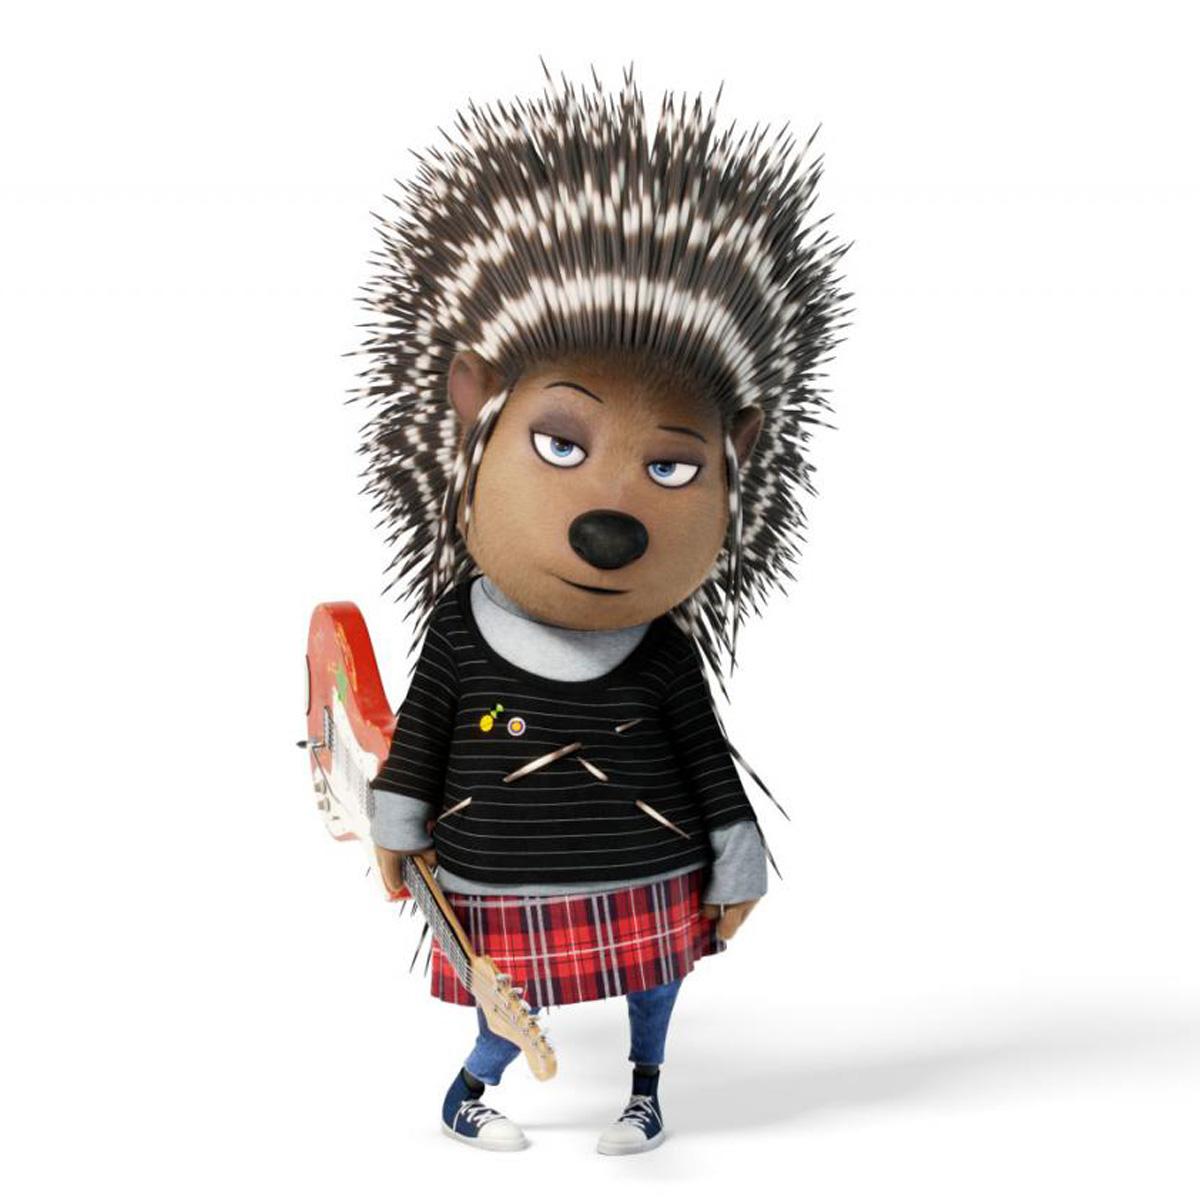 Scarlett Johansson, a Prickly Porcupine in